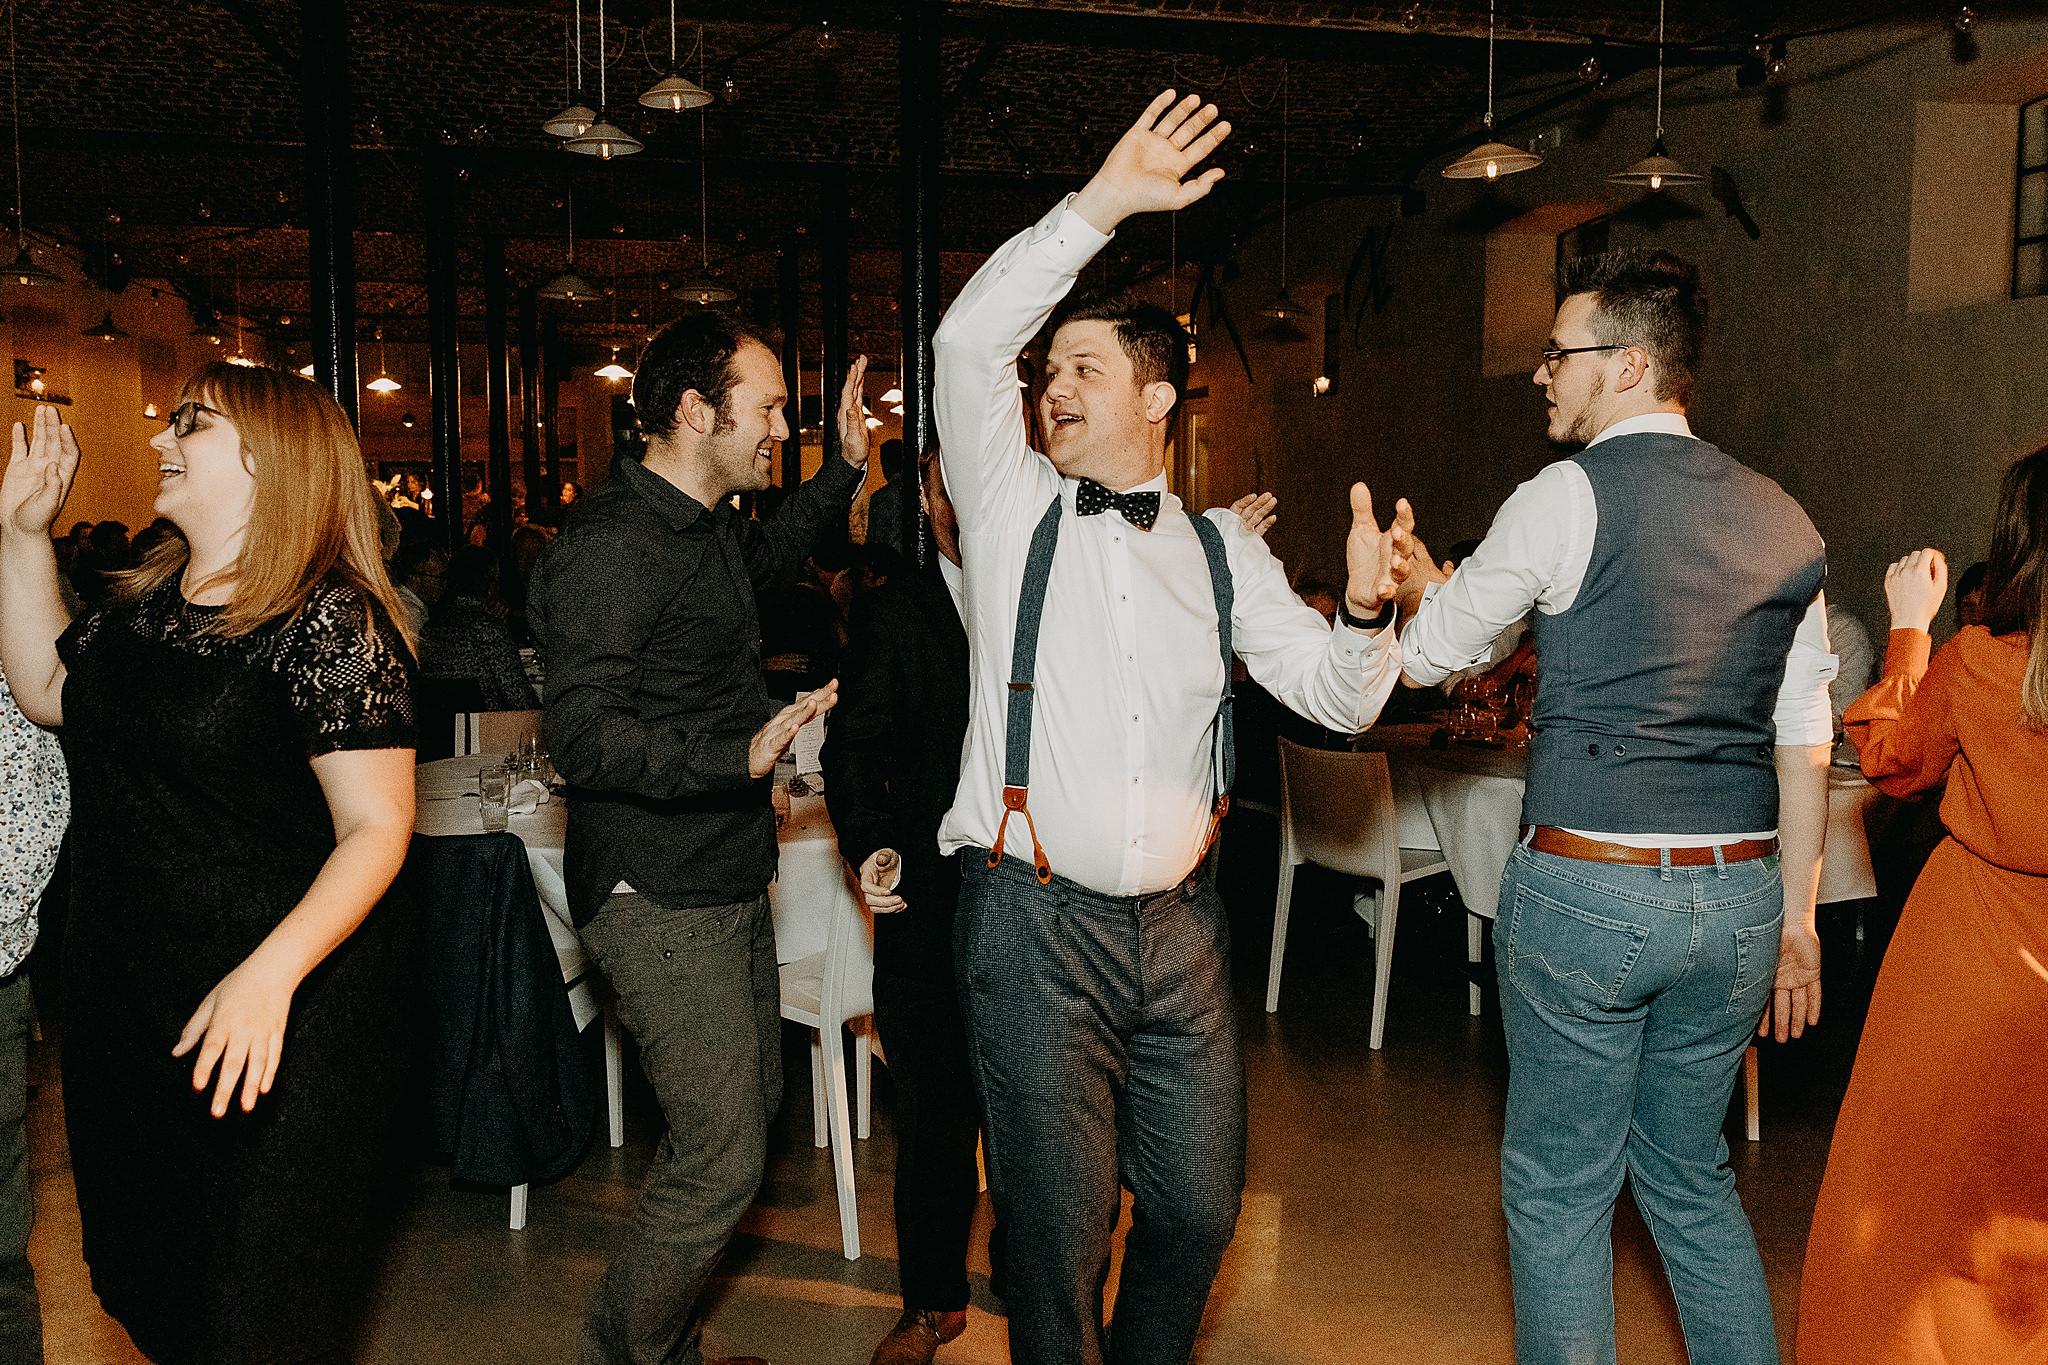 Aulnenhof huwelijk bruidegom danst vrienden